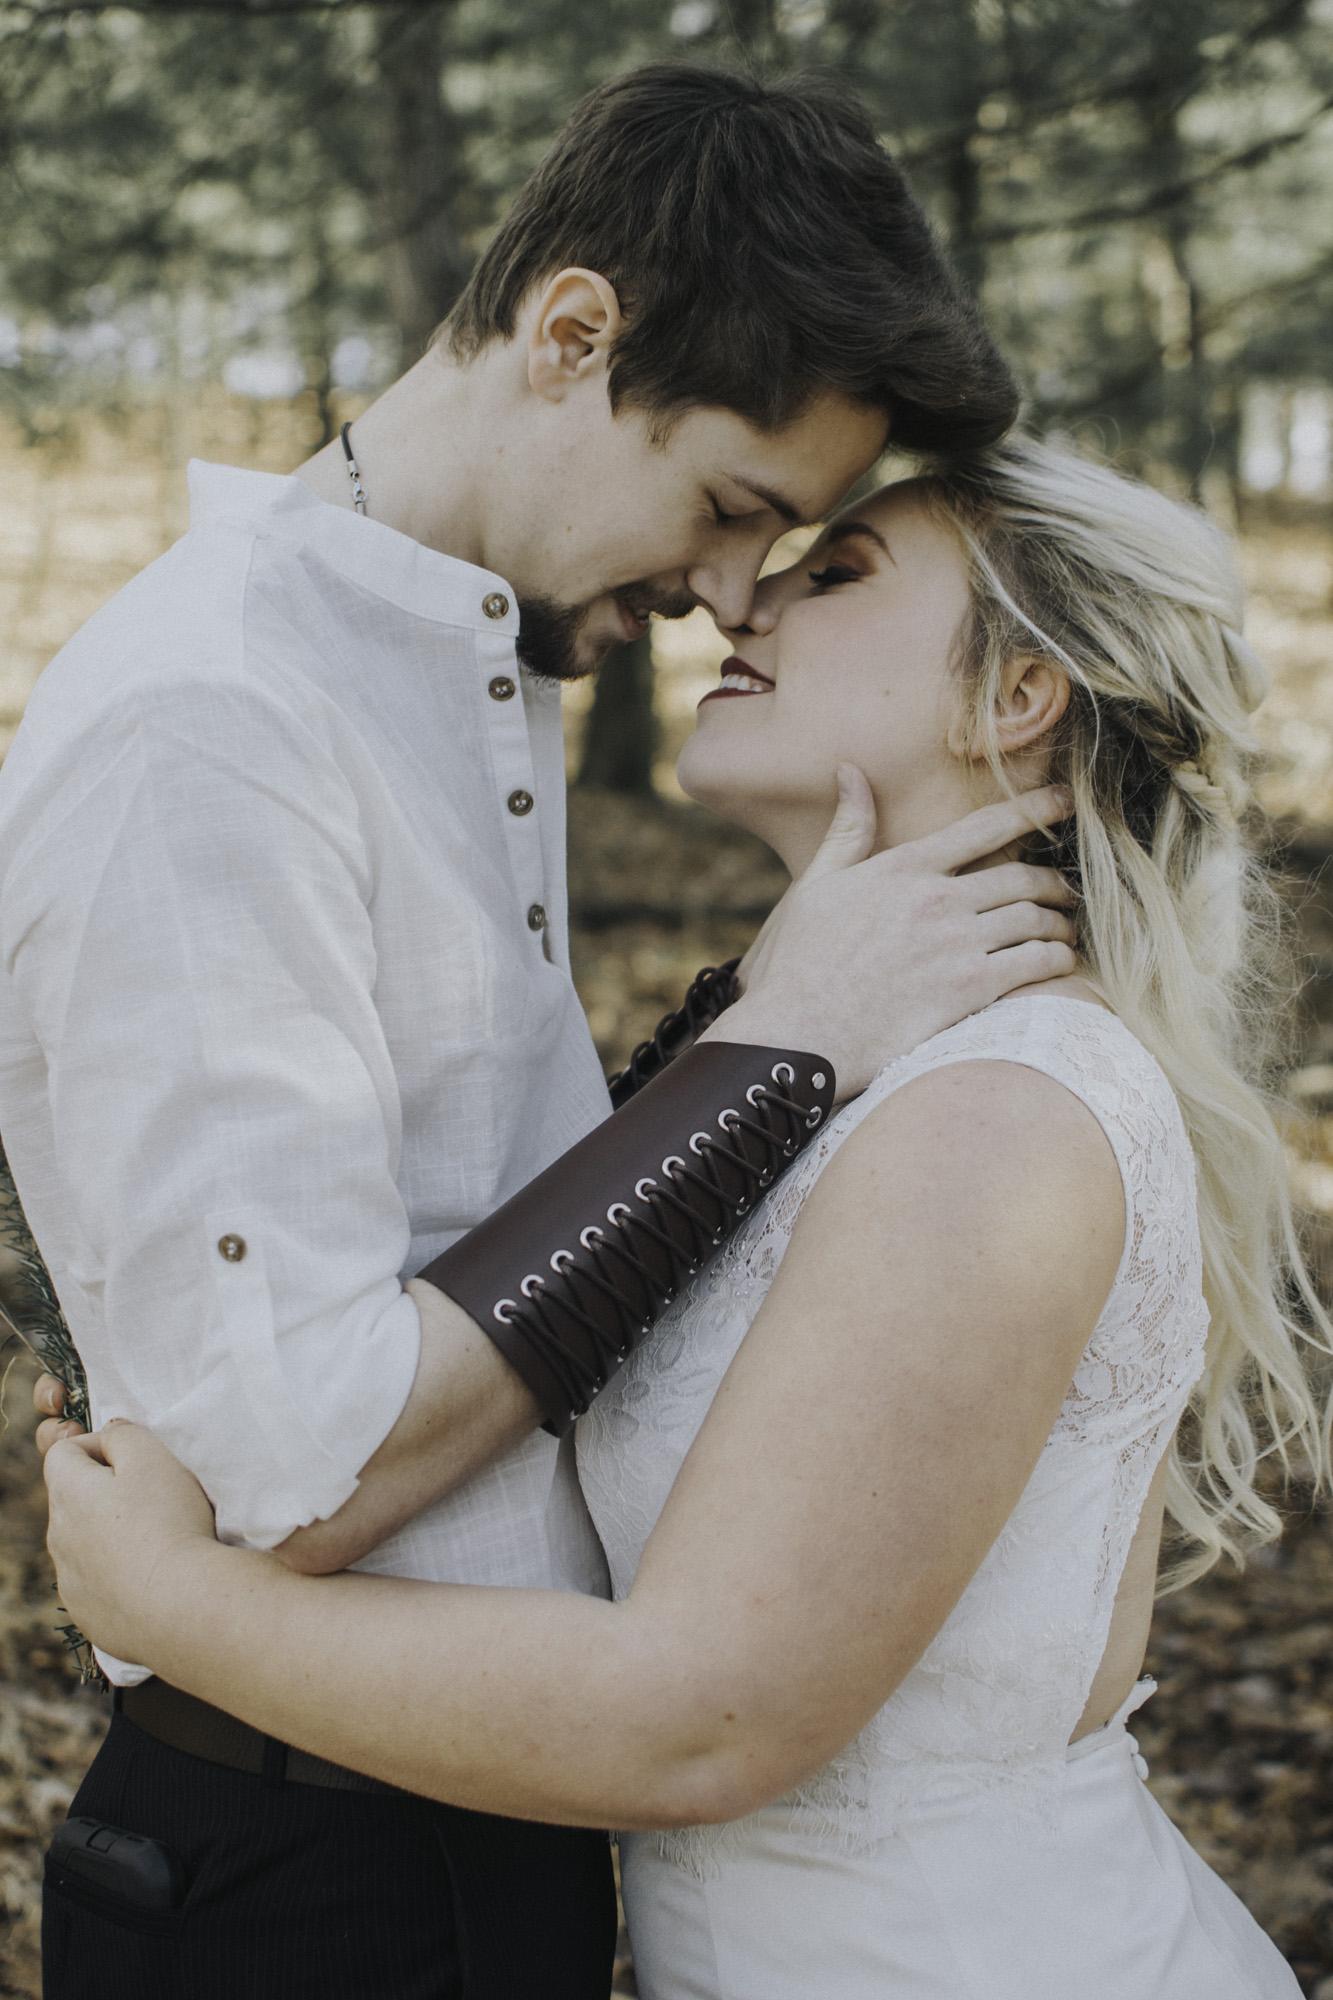 Cate_Ann_Photography_Dayton_Ohio_Wedding_Elopement_And_Engagement_PhotographerDSC_6374.jpg